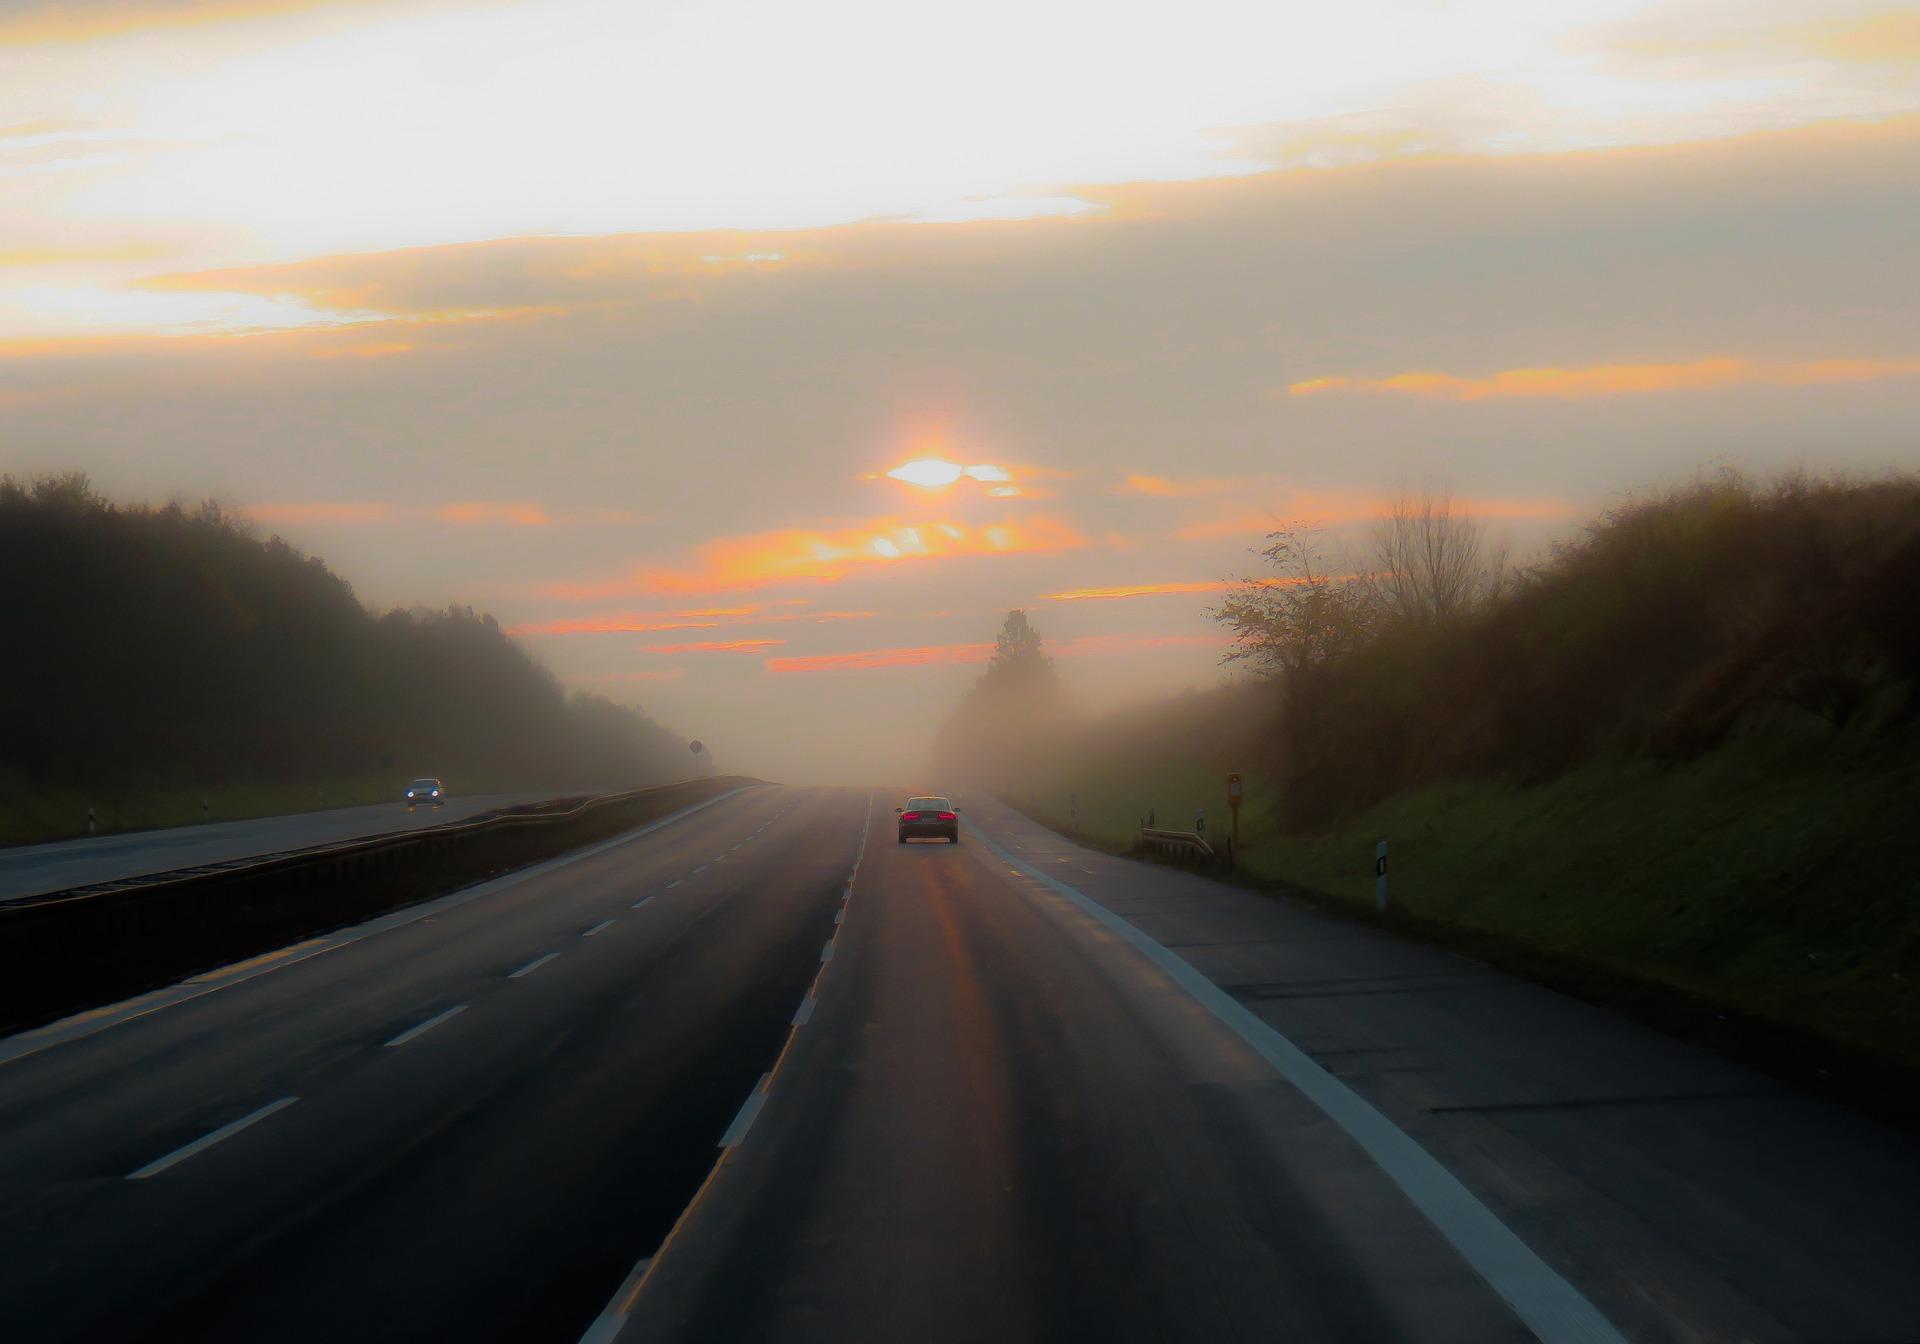 traffic-2906244_1920